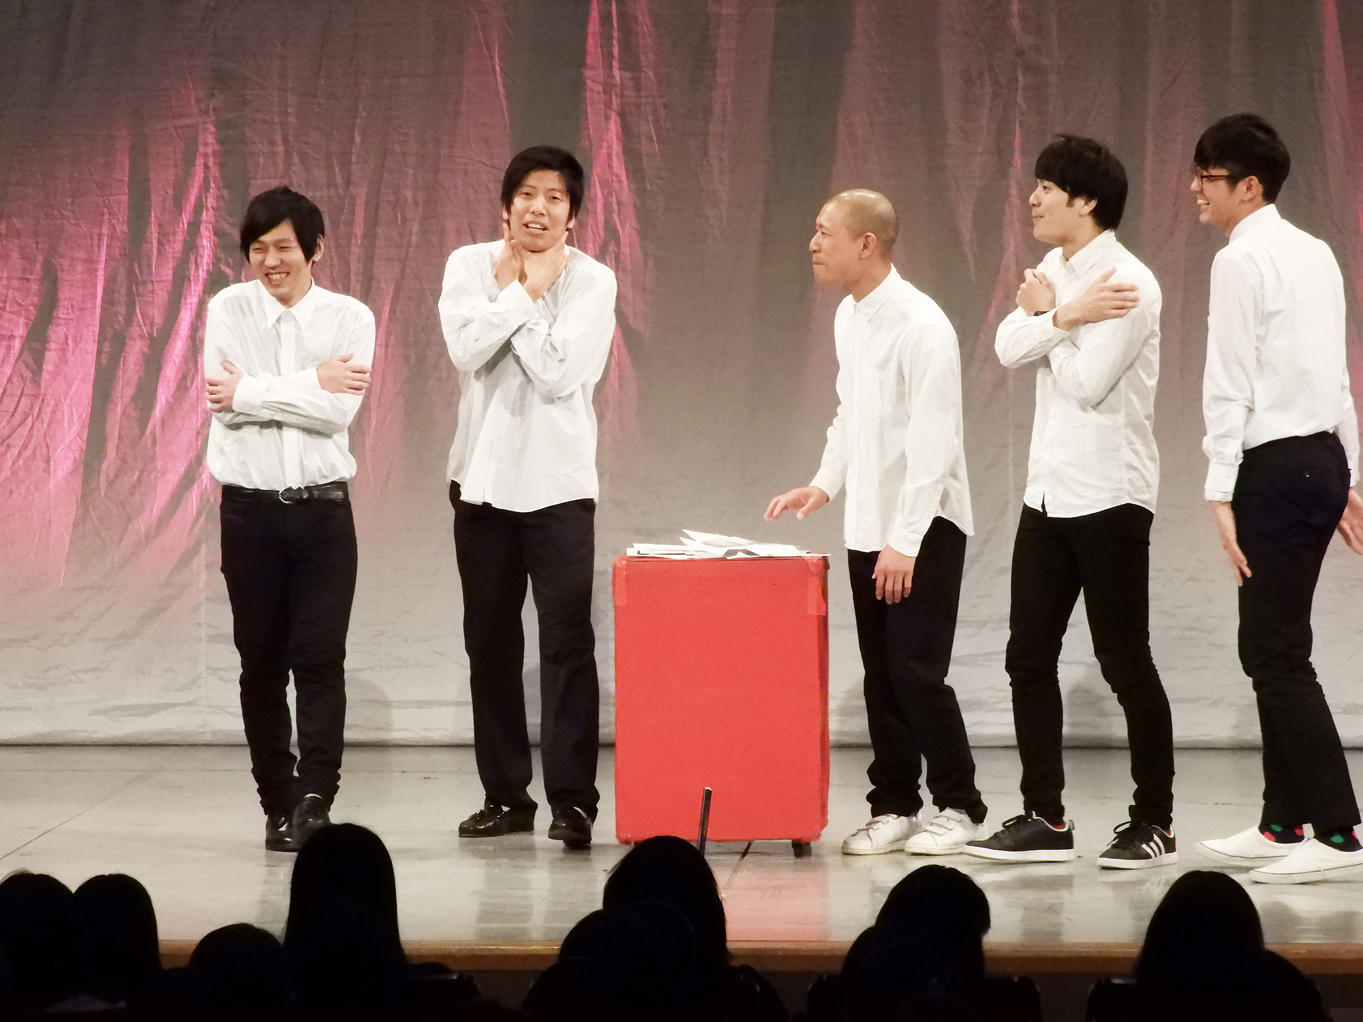 http://news.yoshimoto.co.jp/20180312103420-9e218f4258d661006acdbdf77883ac18d272d545.jpg